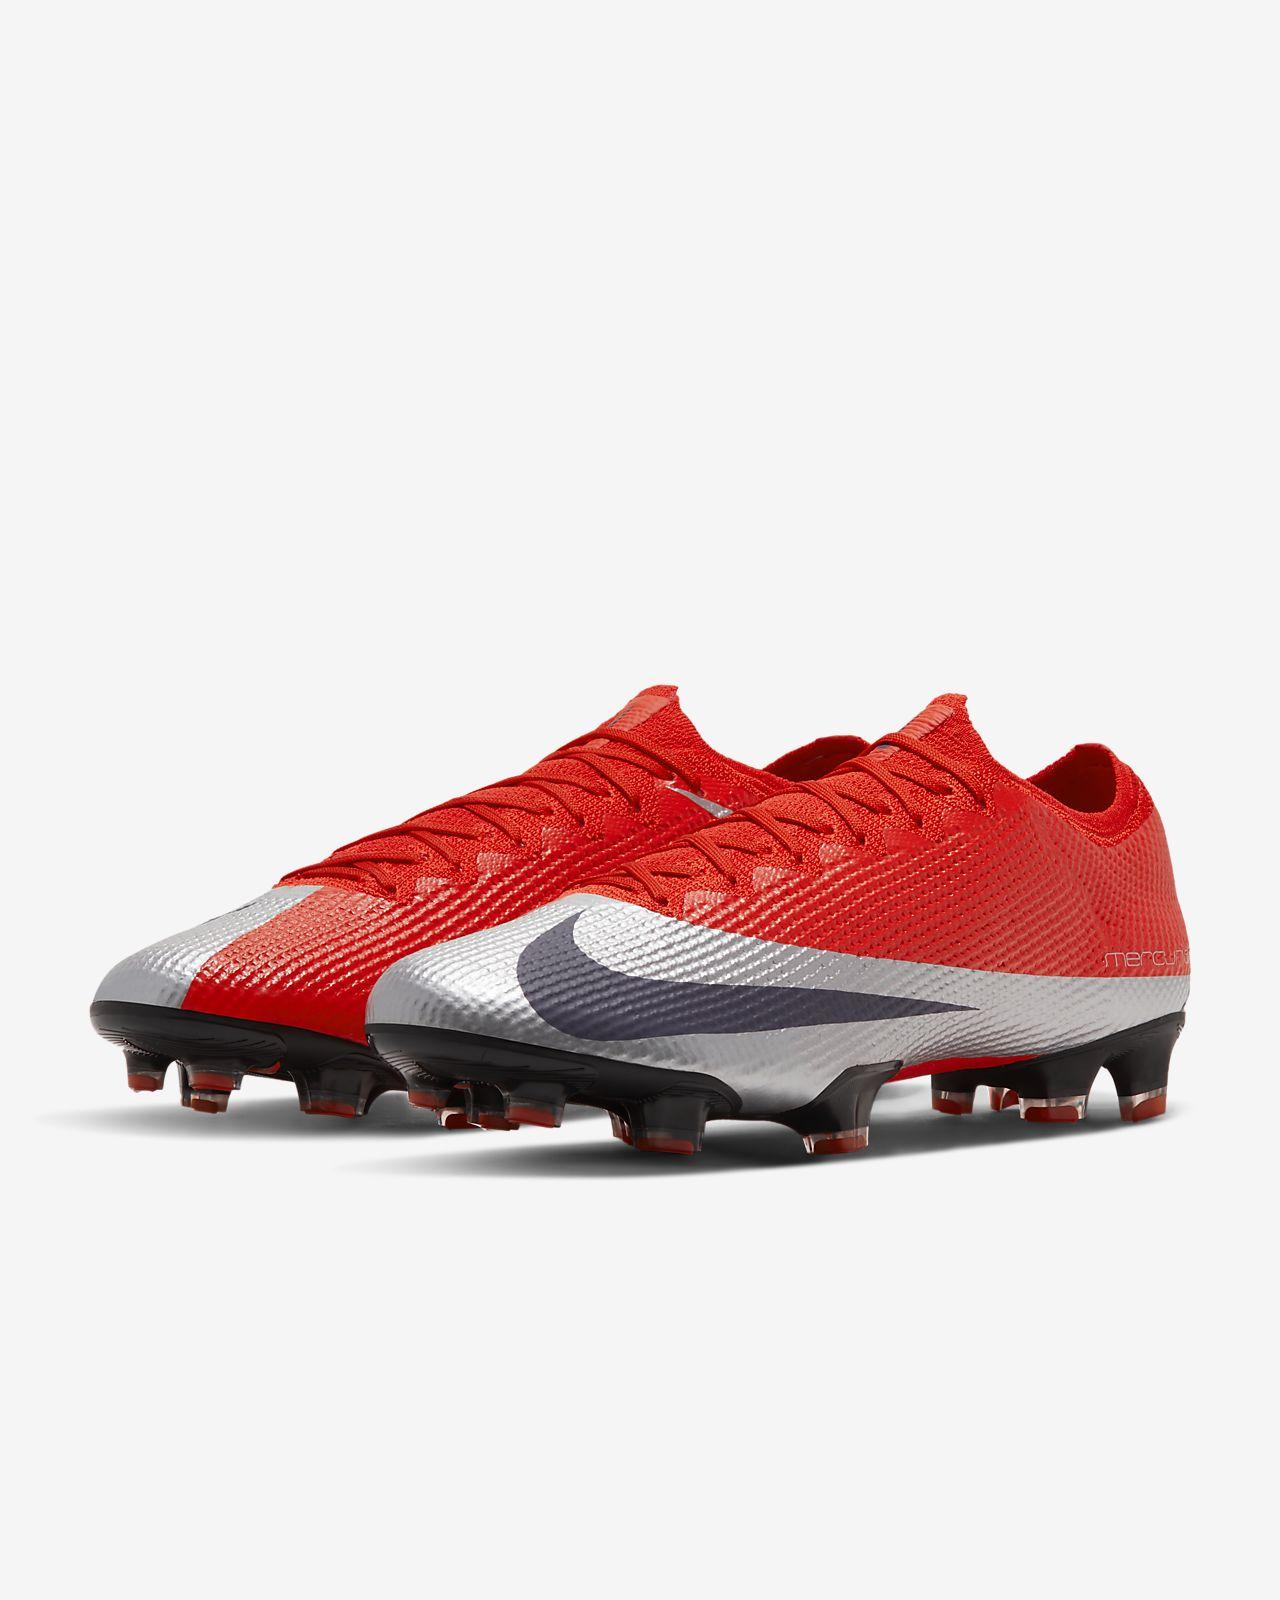 New Nike Soccer Shoes Mercurial Vapor Flyknit Ultra FG